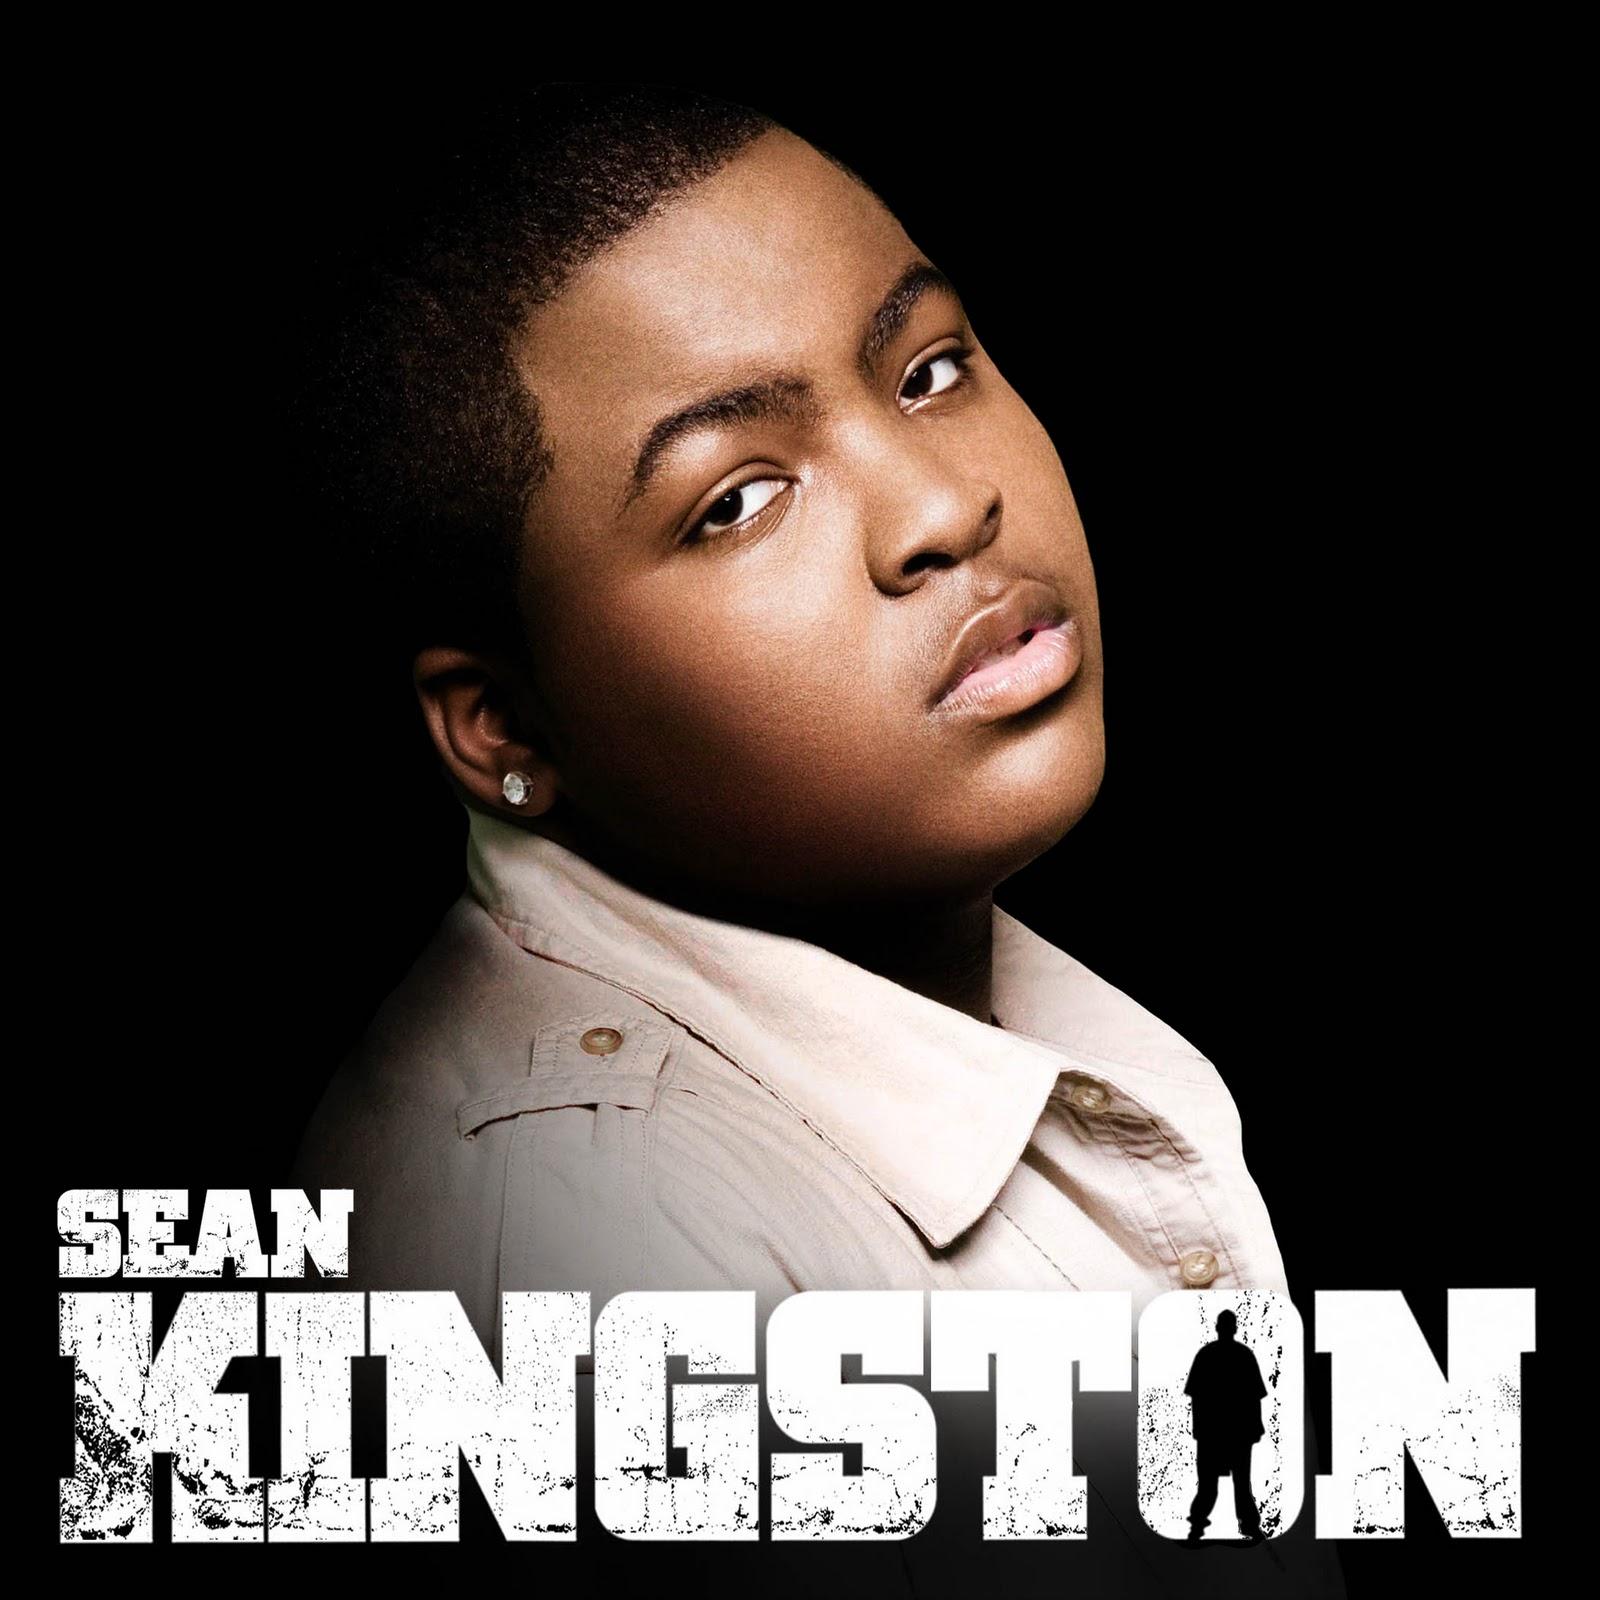 Sean Kingston Net Worth